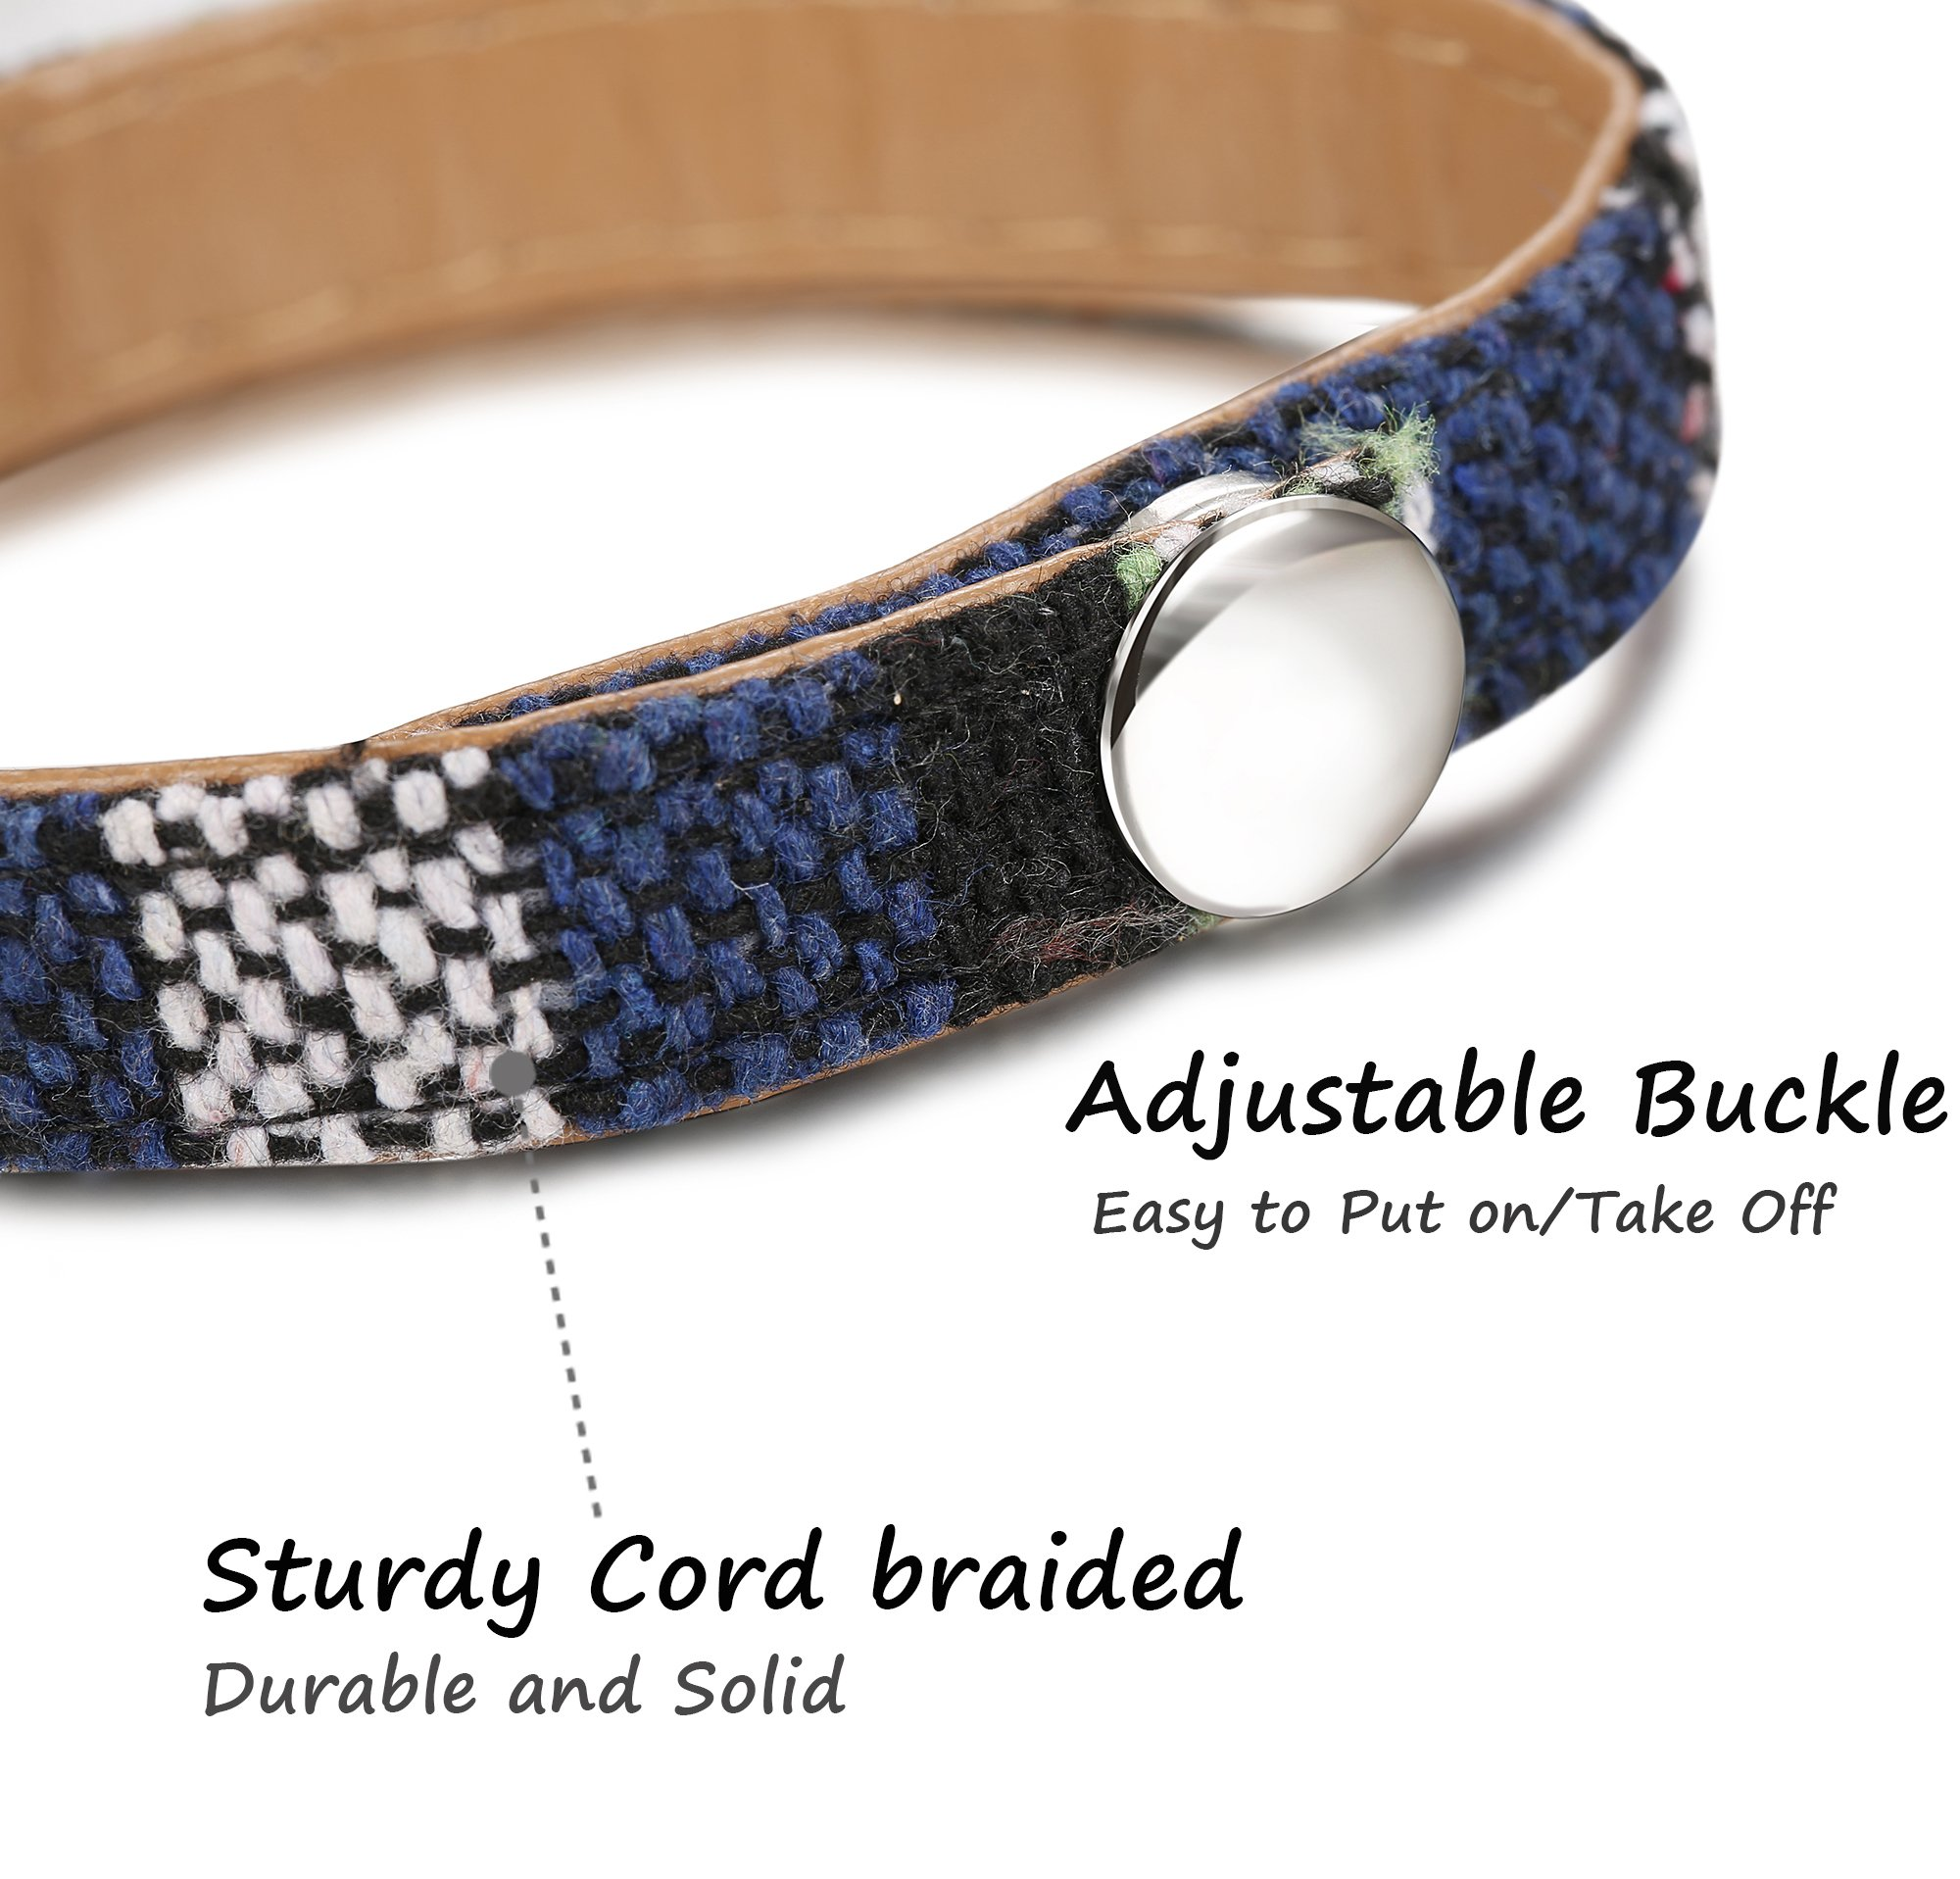 Jstyle 6-12Pcs Wrap Bracelets for Women Men Hemp Cords Ethnic Tribal Bracelet Wooden Beads Leather Bracelets Wristbands by Jstyle (Image #3)